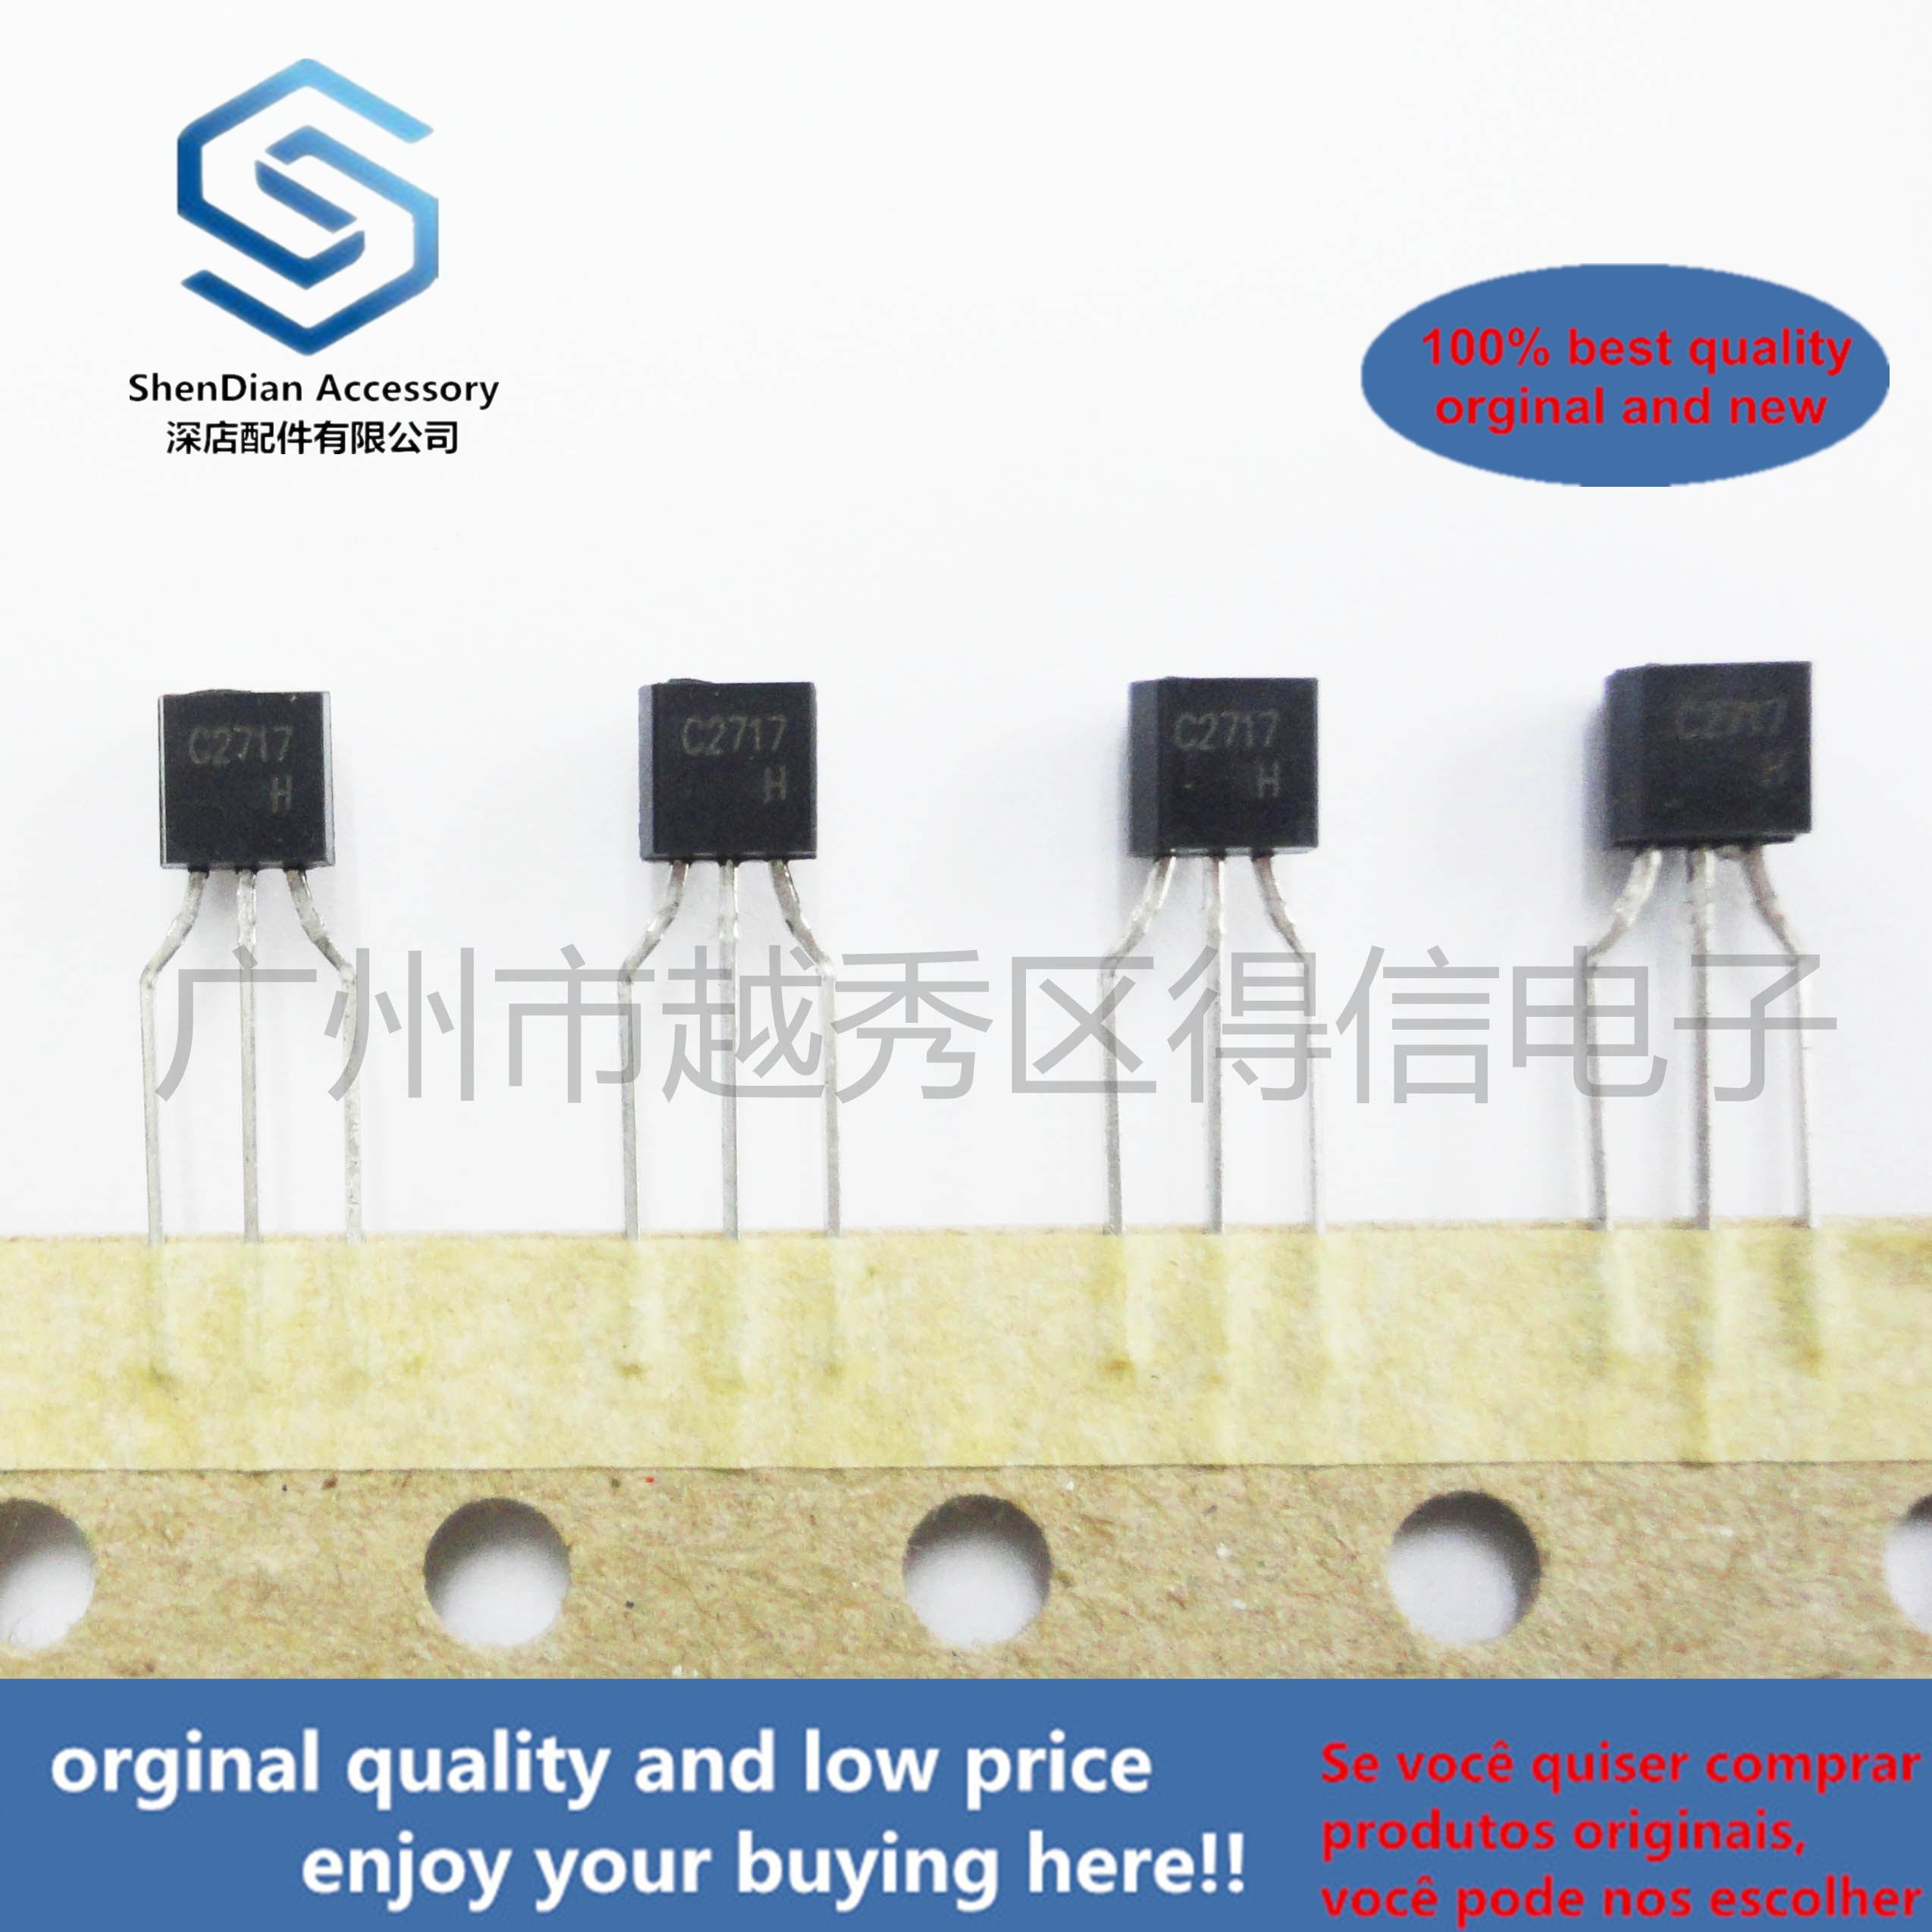 10pcs 100% Orginal New  2SC2717 C2717 TO-92 TO-92 Plastic-Encapsulate Transistors Real Photo